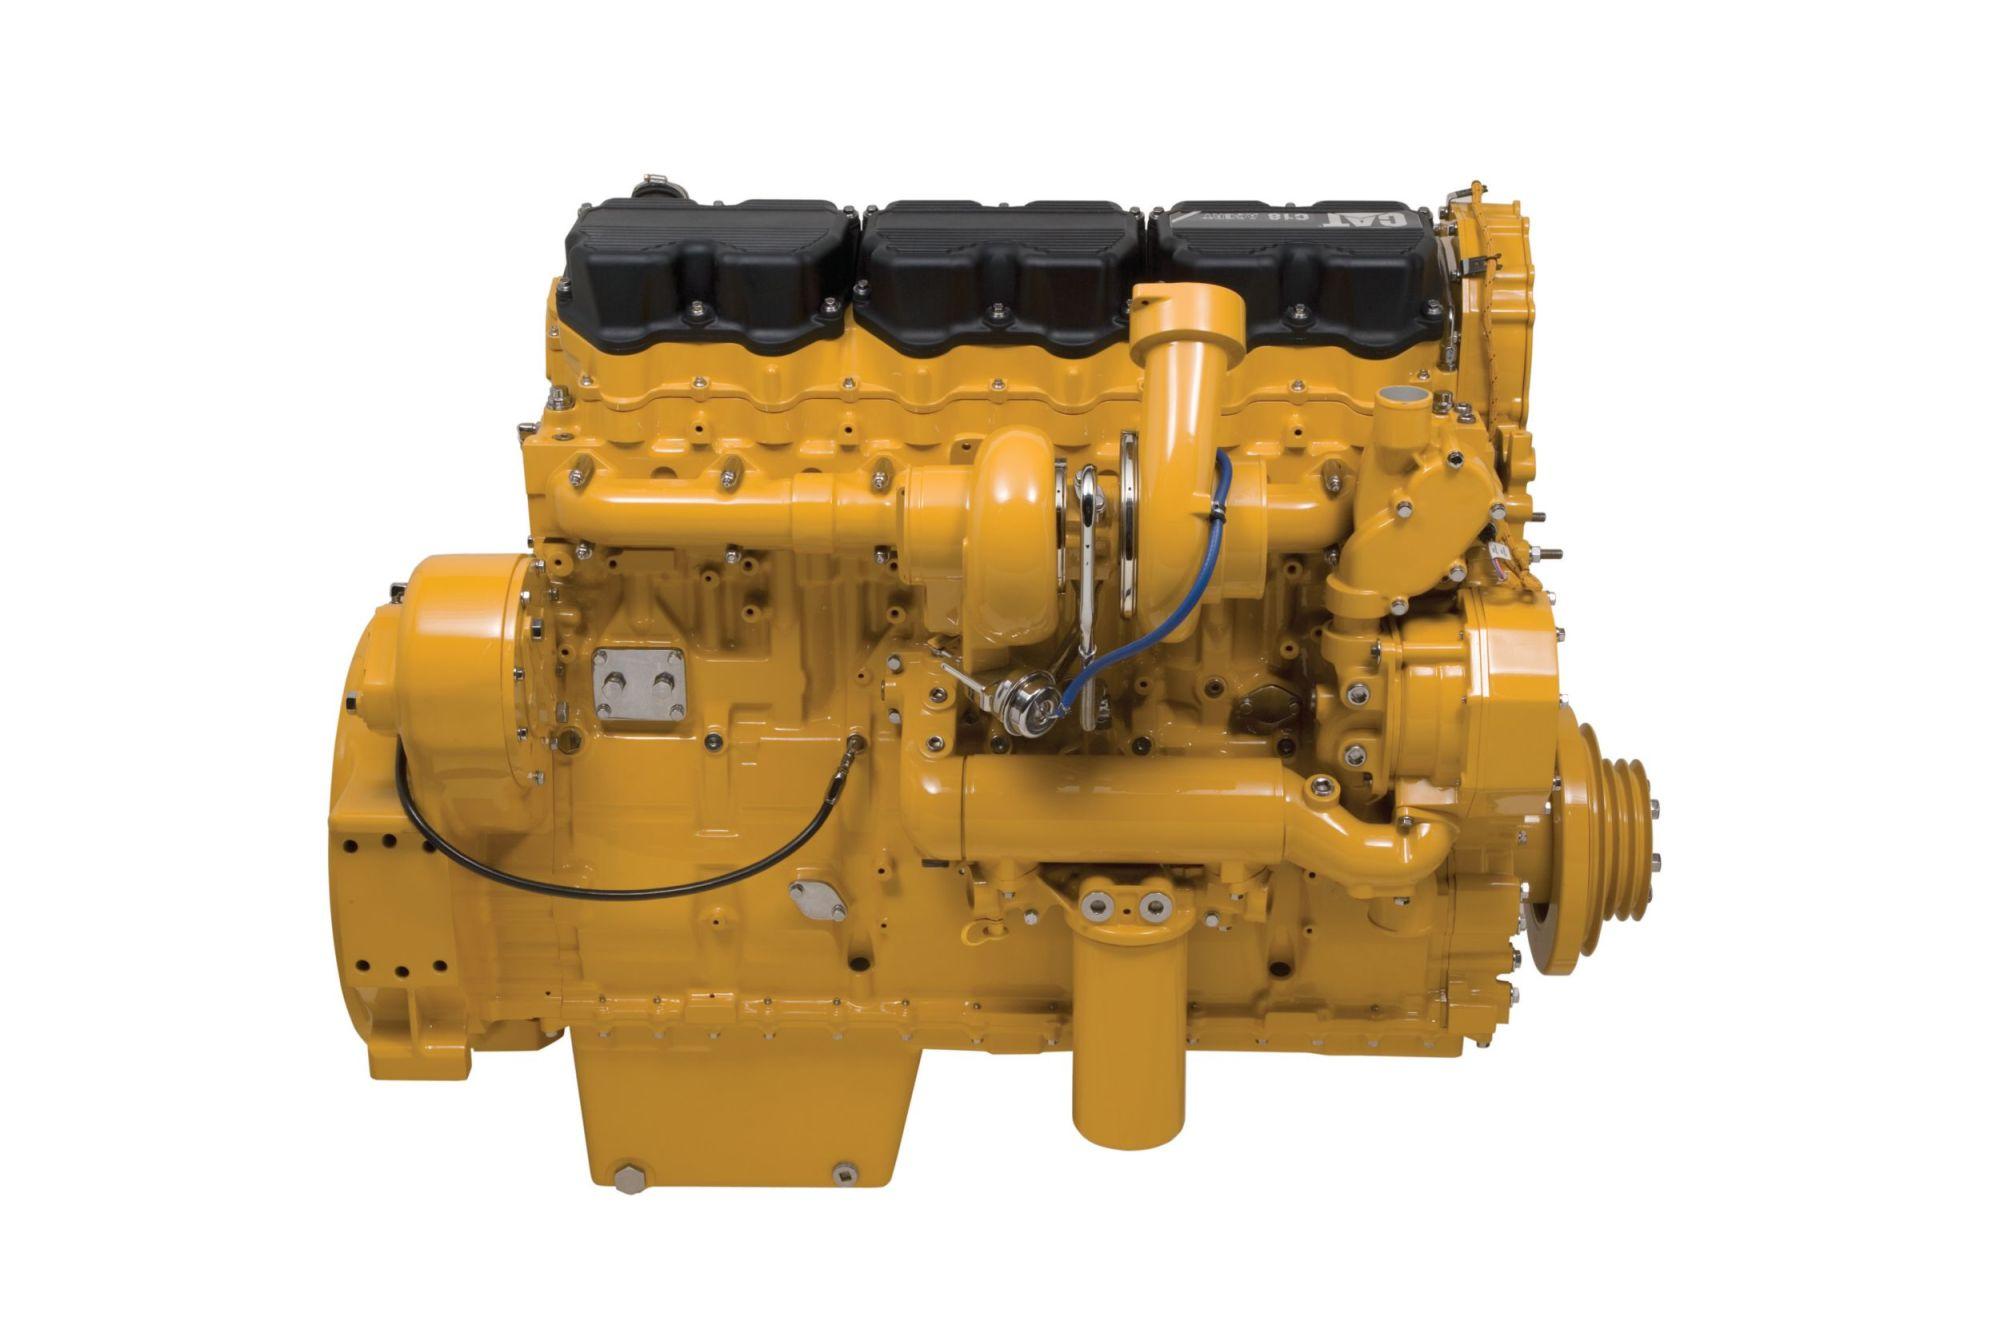 hight resolution of c18 acert land mechanical drilling engine